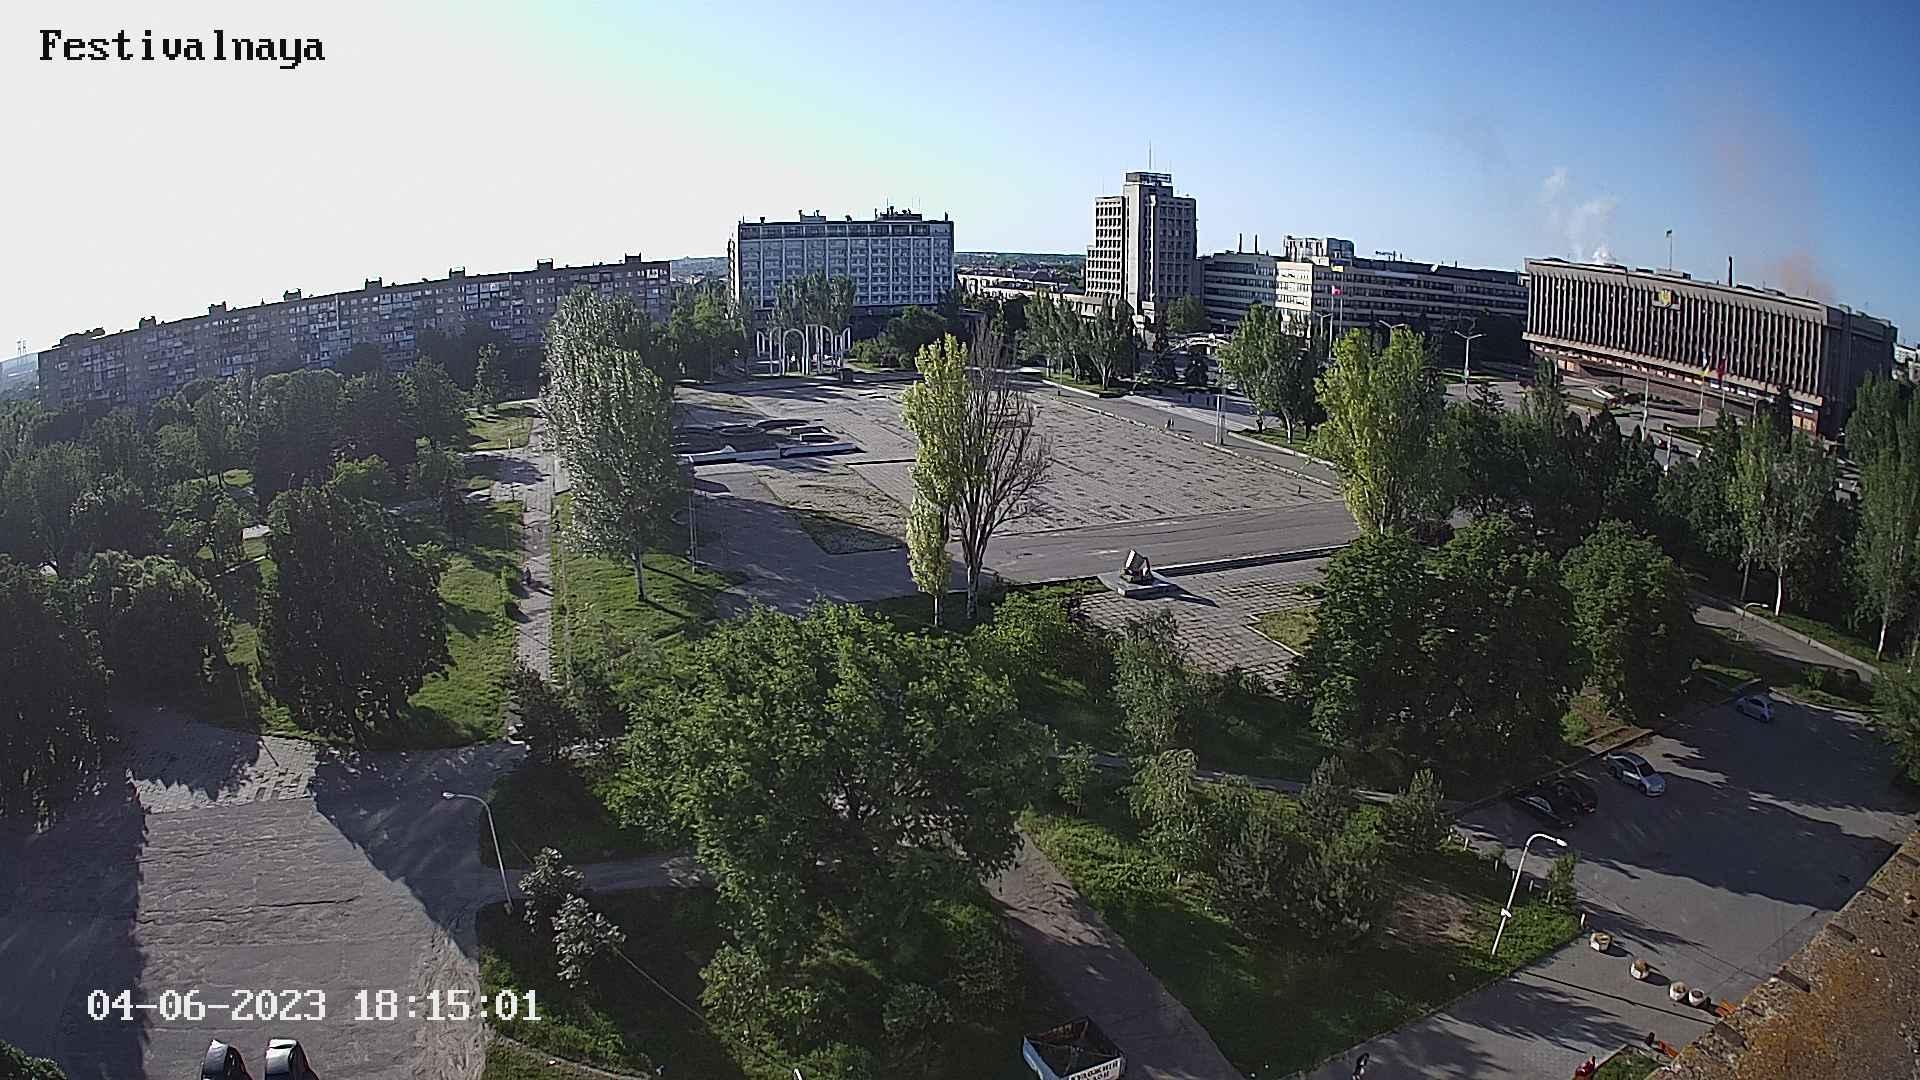 Webkamera Voznesenka: площадь Фестивальная